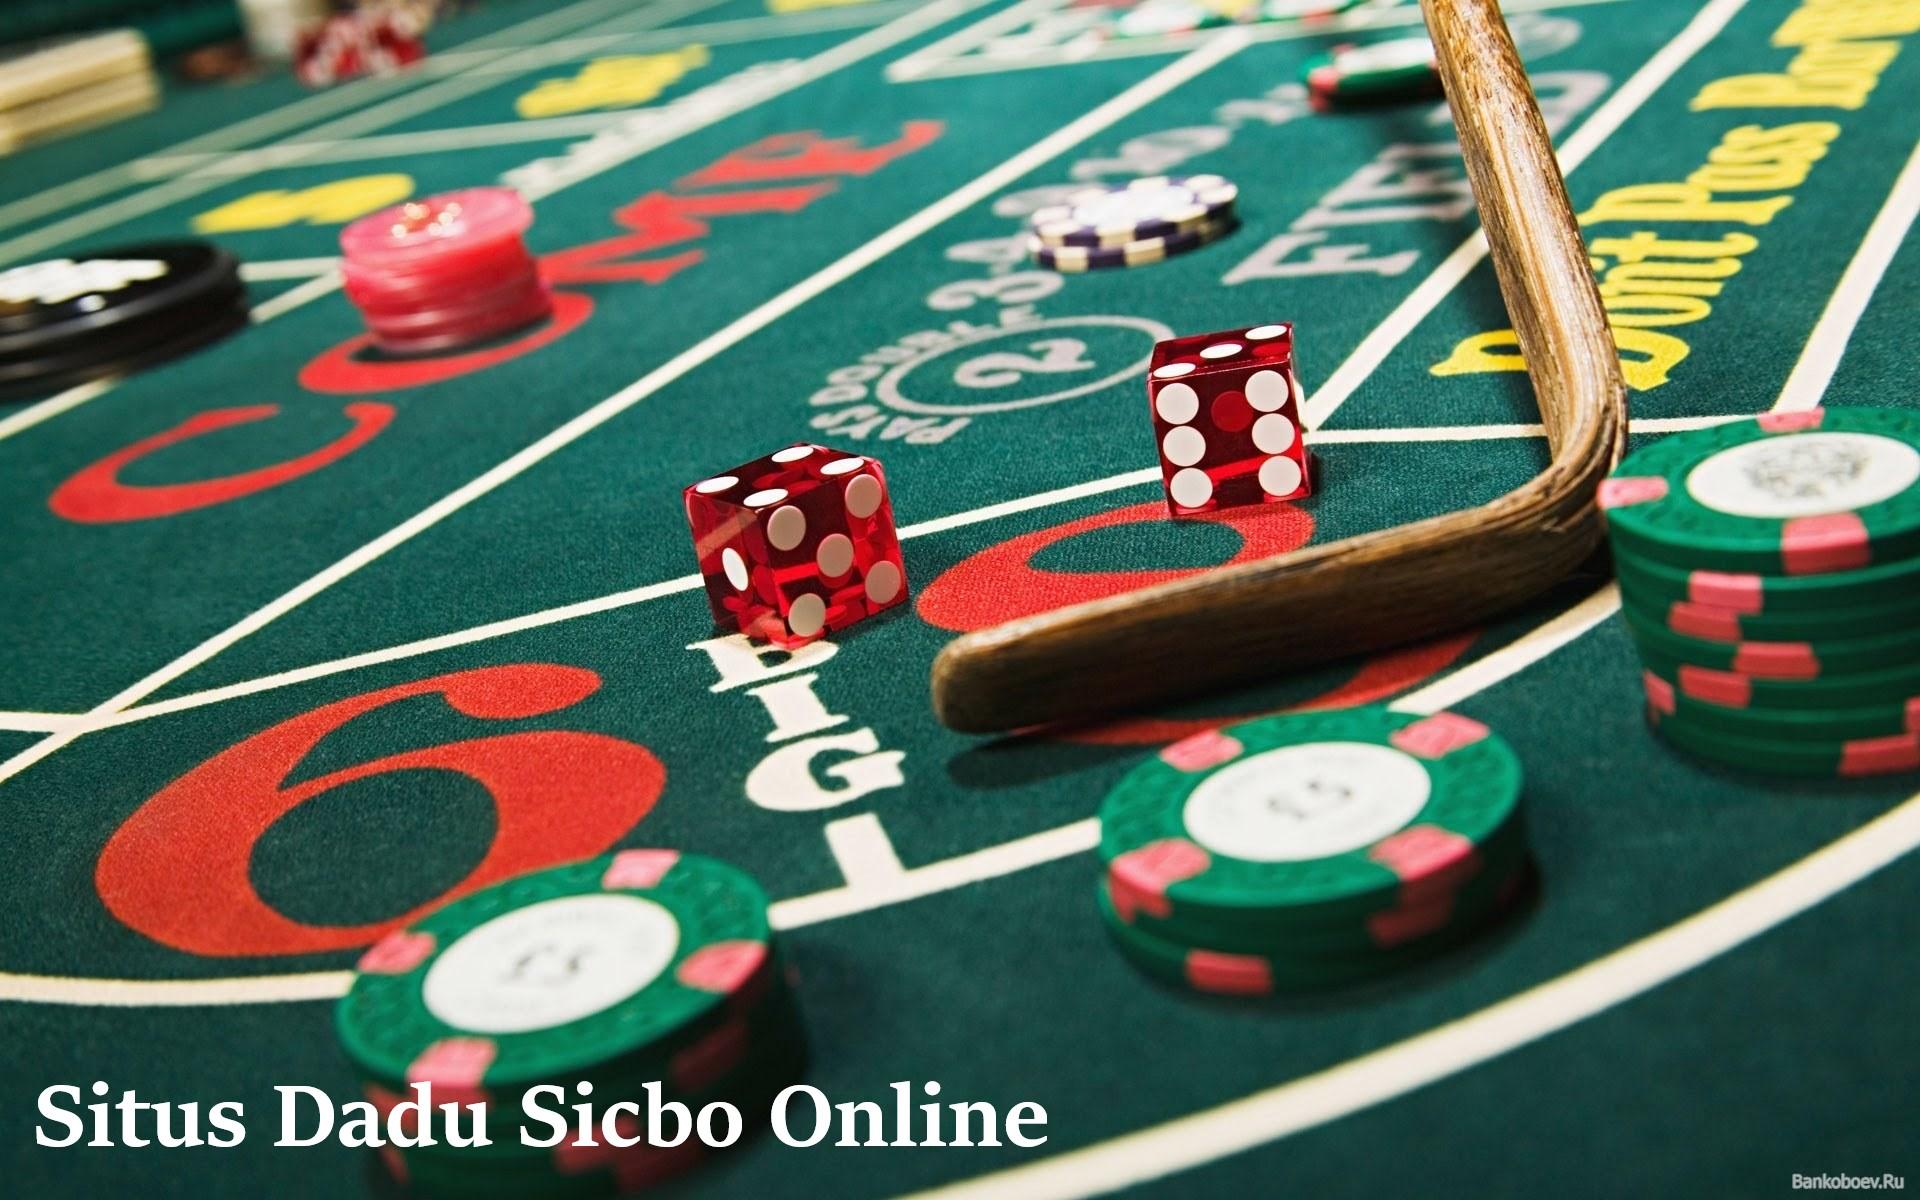 Situs Dadu Sicbo Online